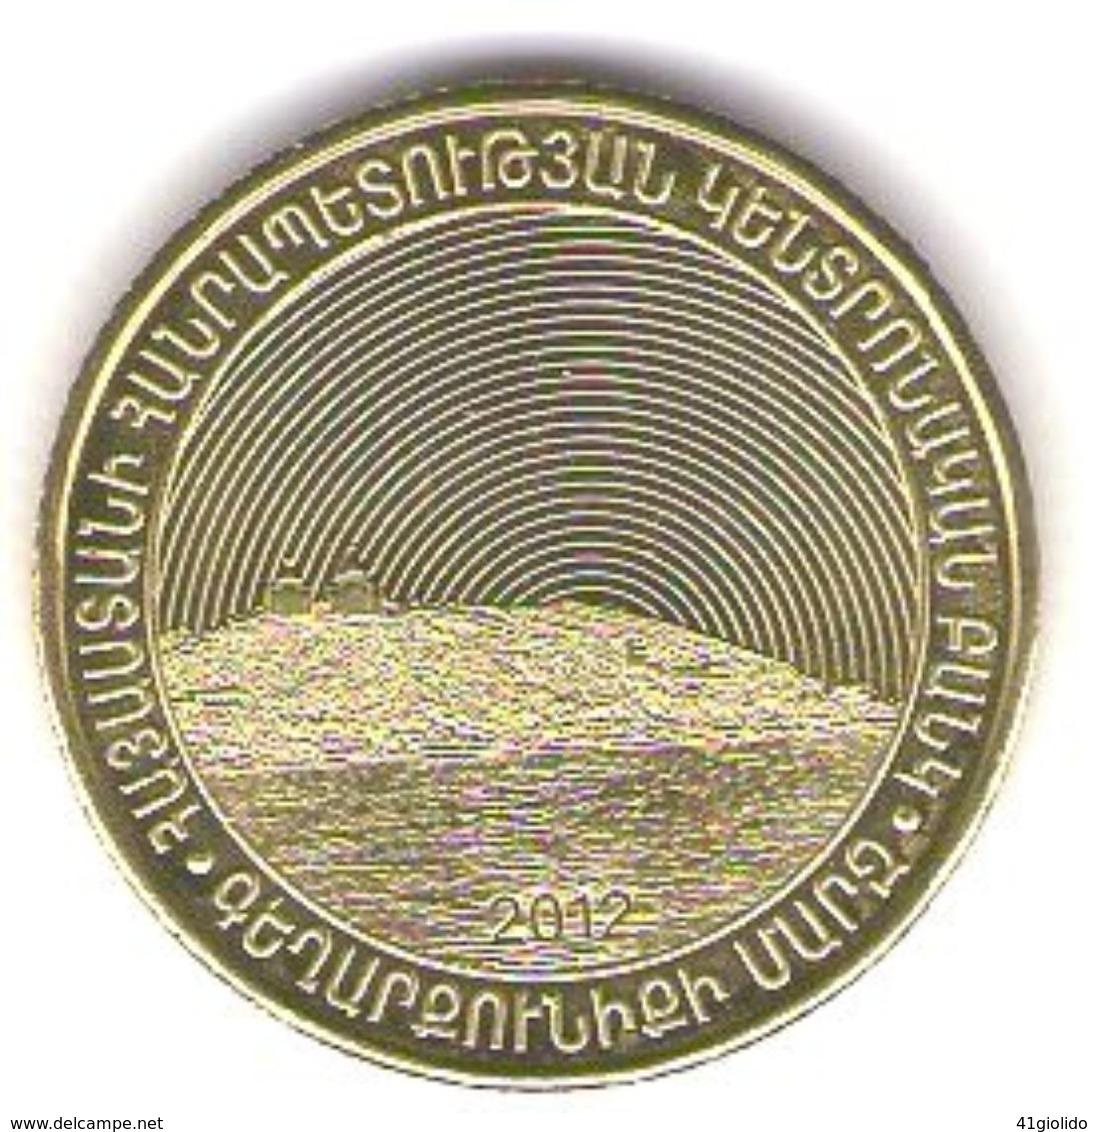 Armenia 50 Dram 2012 Gegharkuniq Region - Armenia